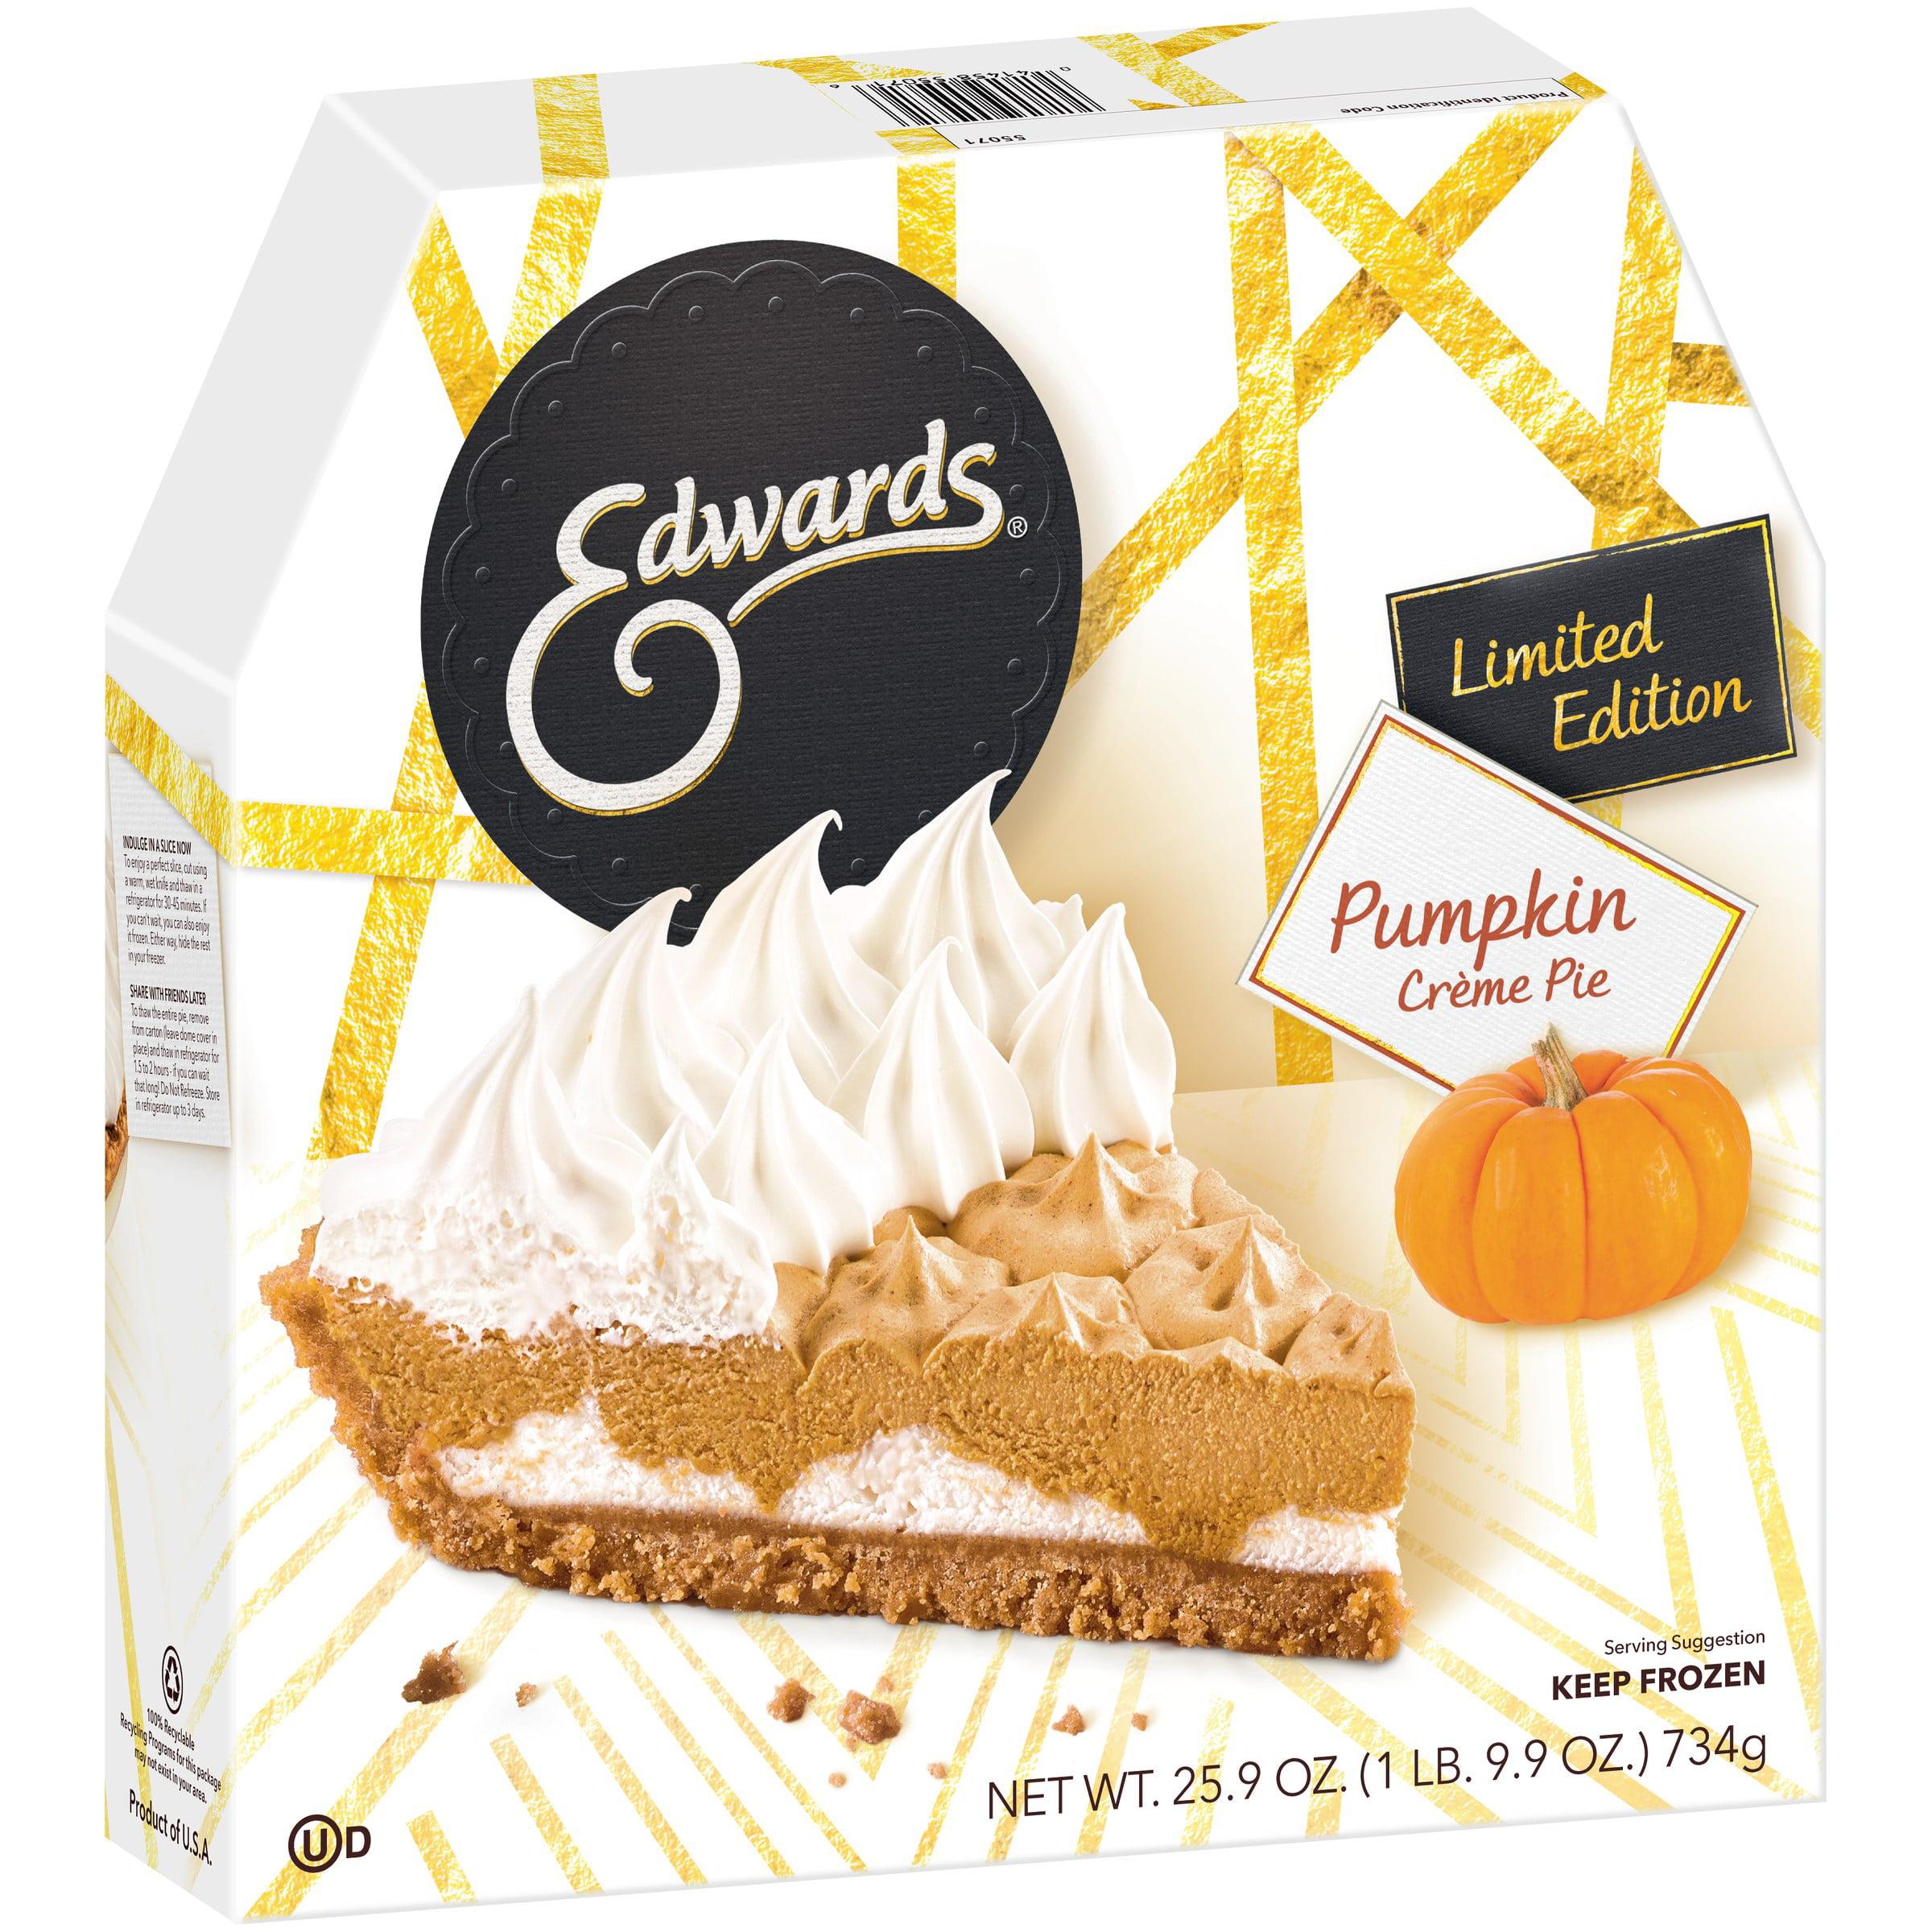 Edwards Limited Edition Pumpkin Cr¨me Pie 25 9 oz Box Walmart